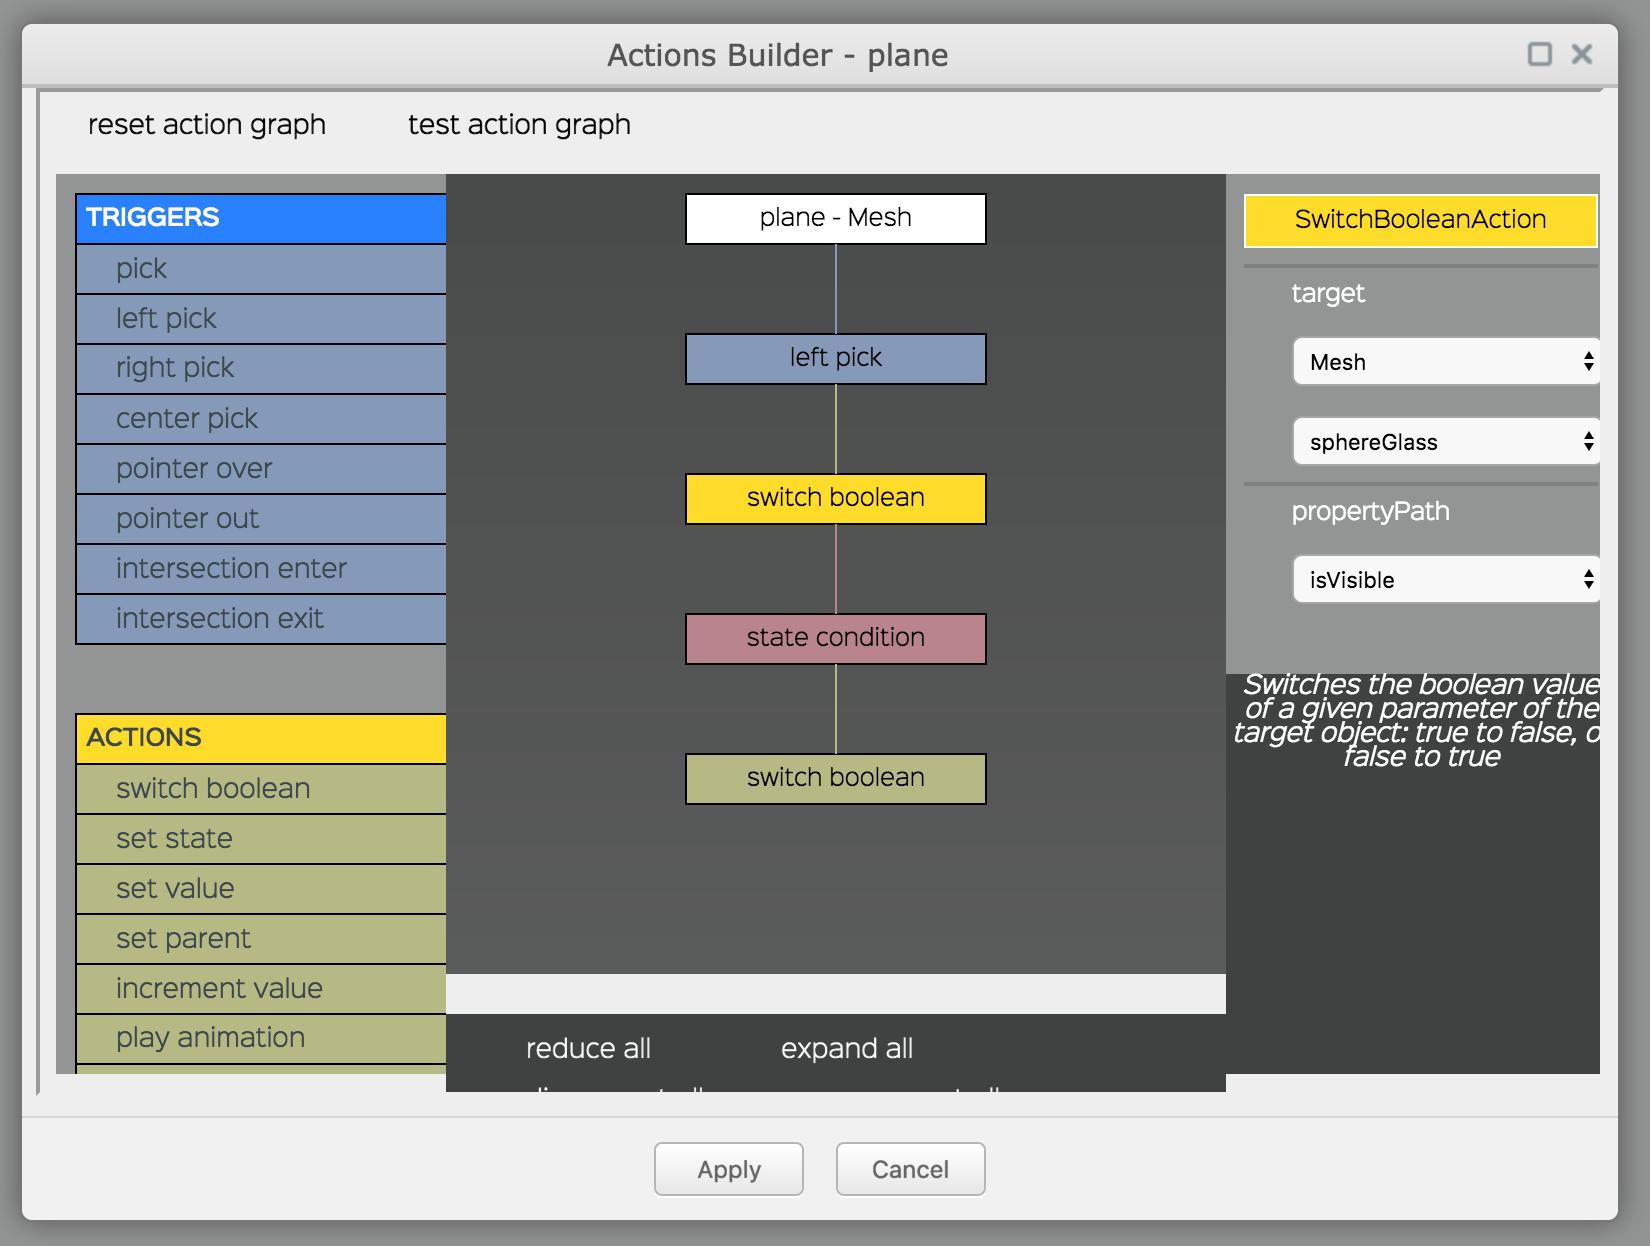 ActionsBuilderWindow